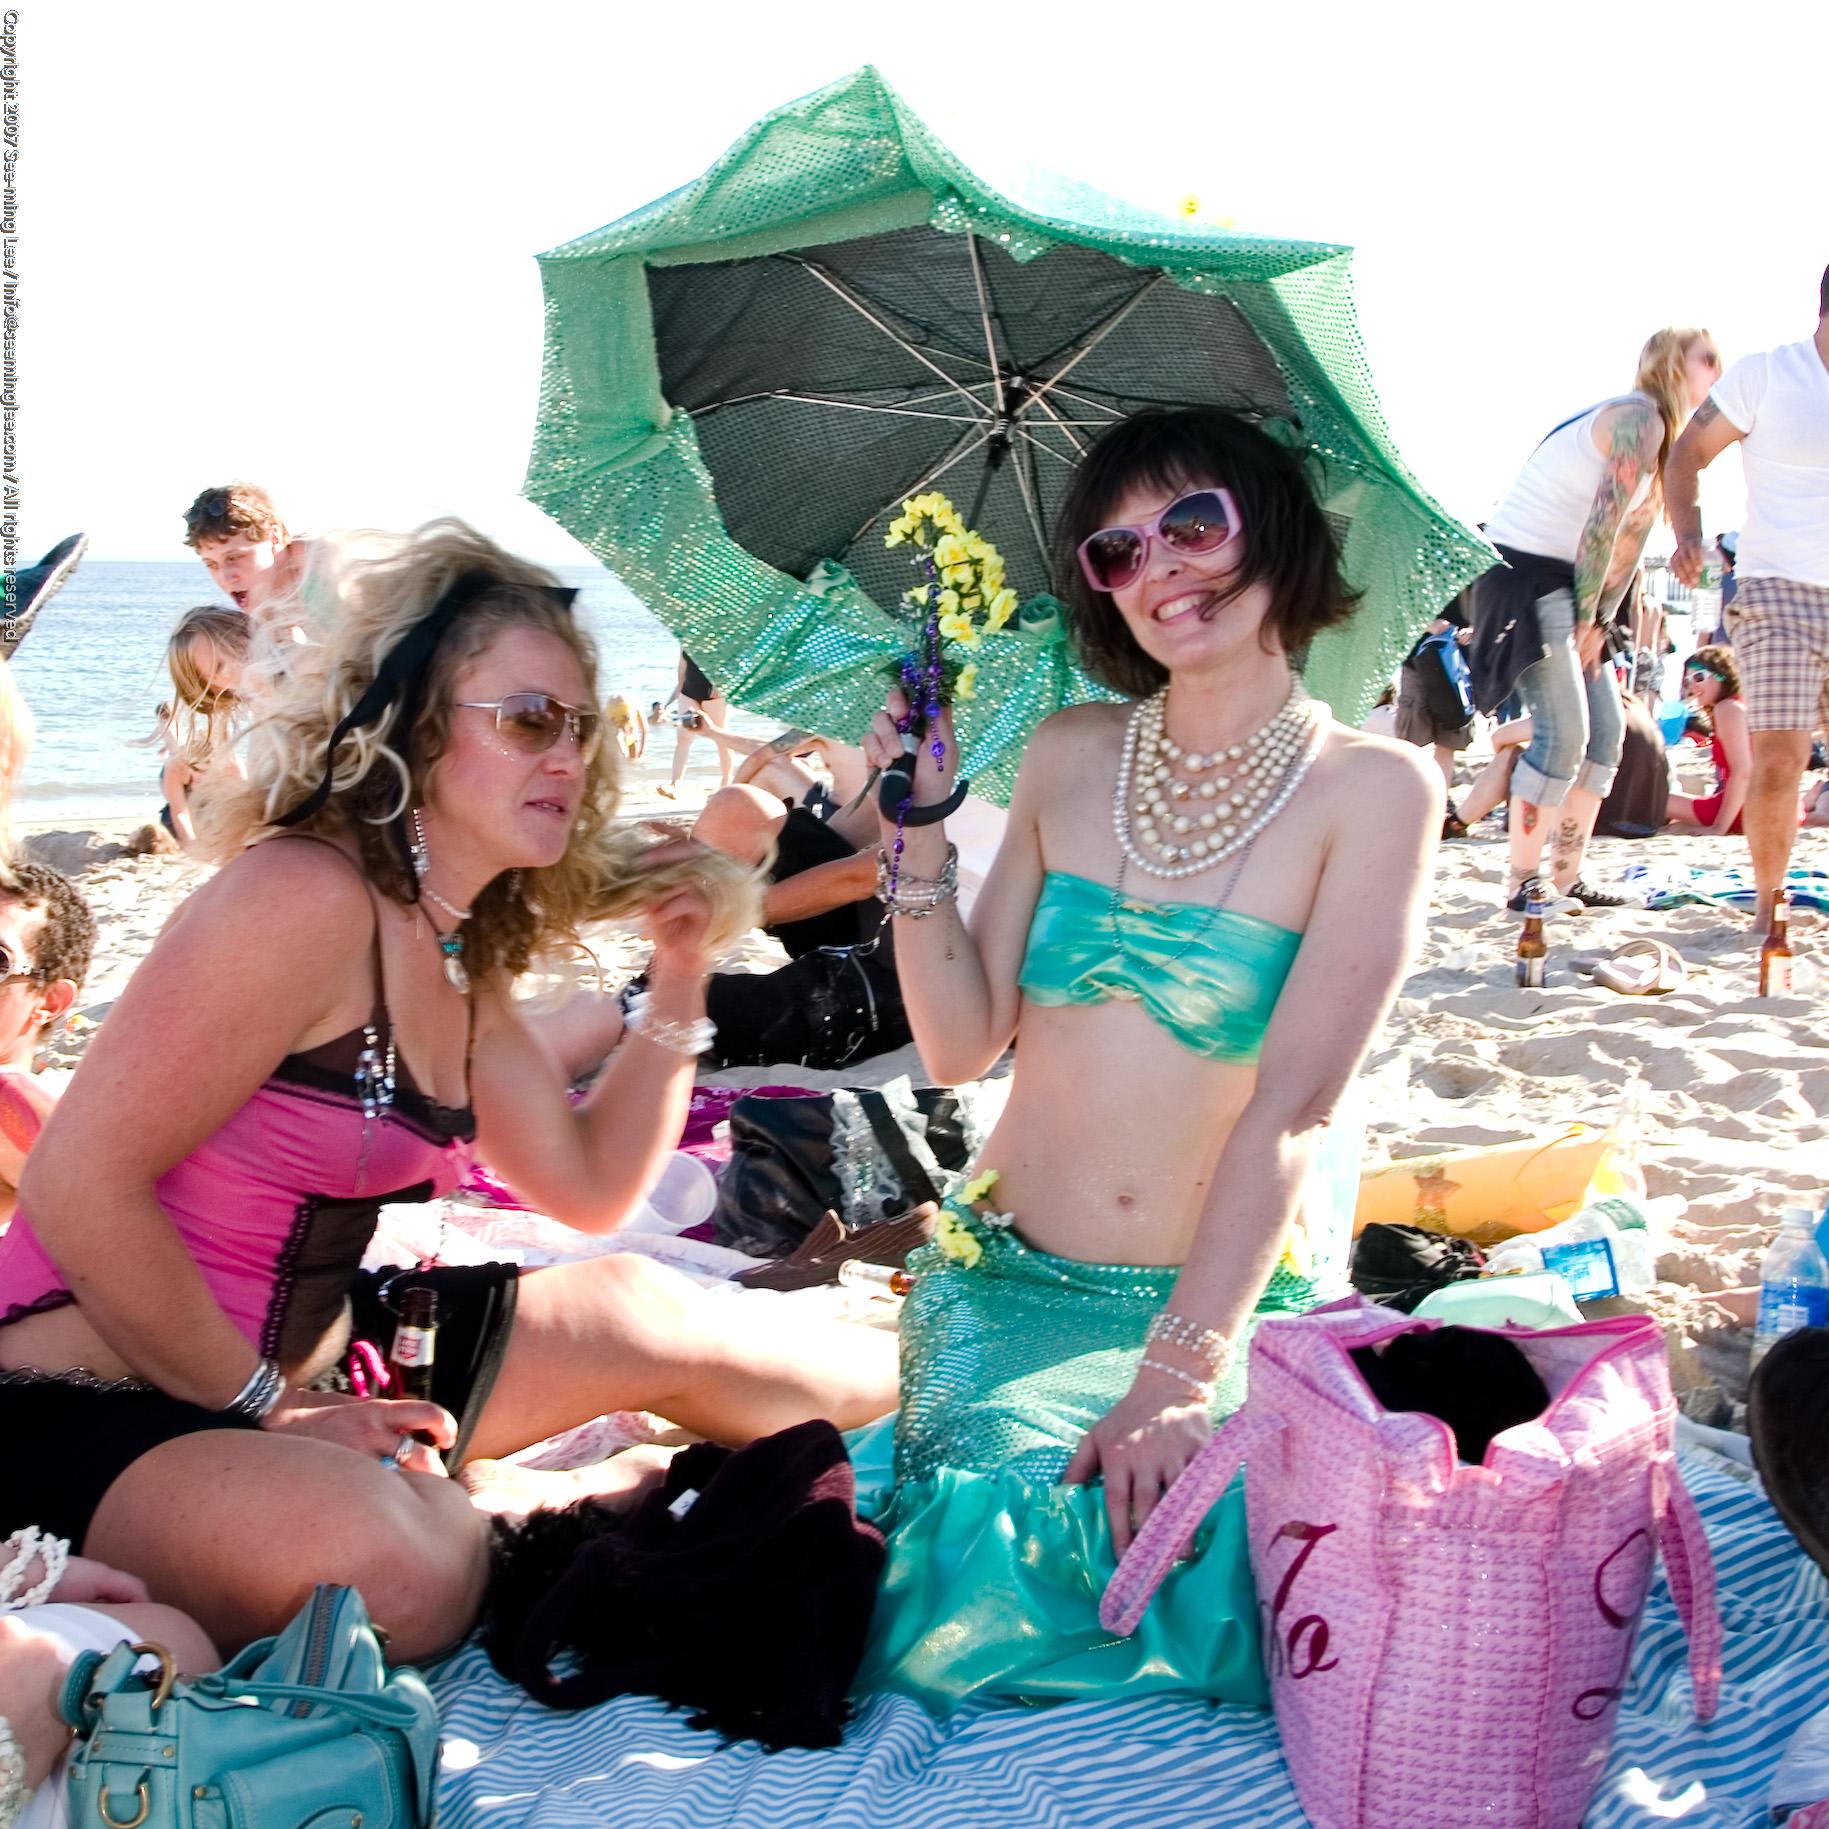 Relaxation / Coney Island Mermaid Parade 2007 / SML | Flickr